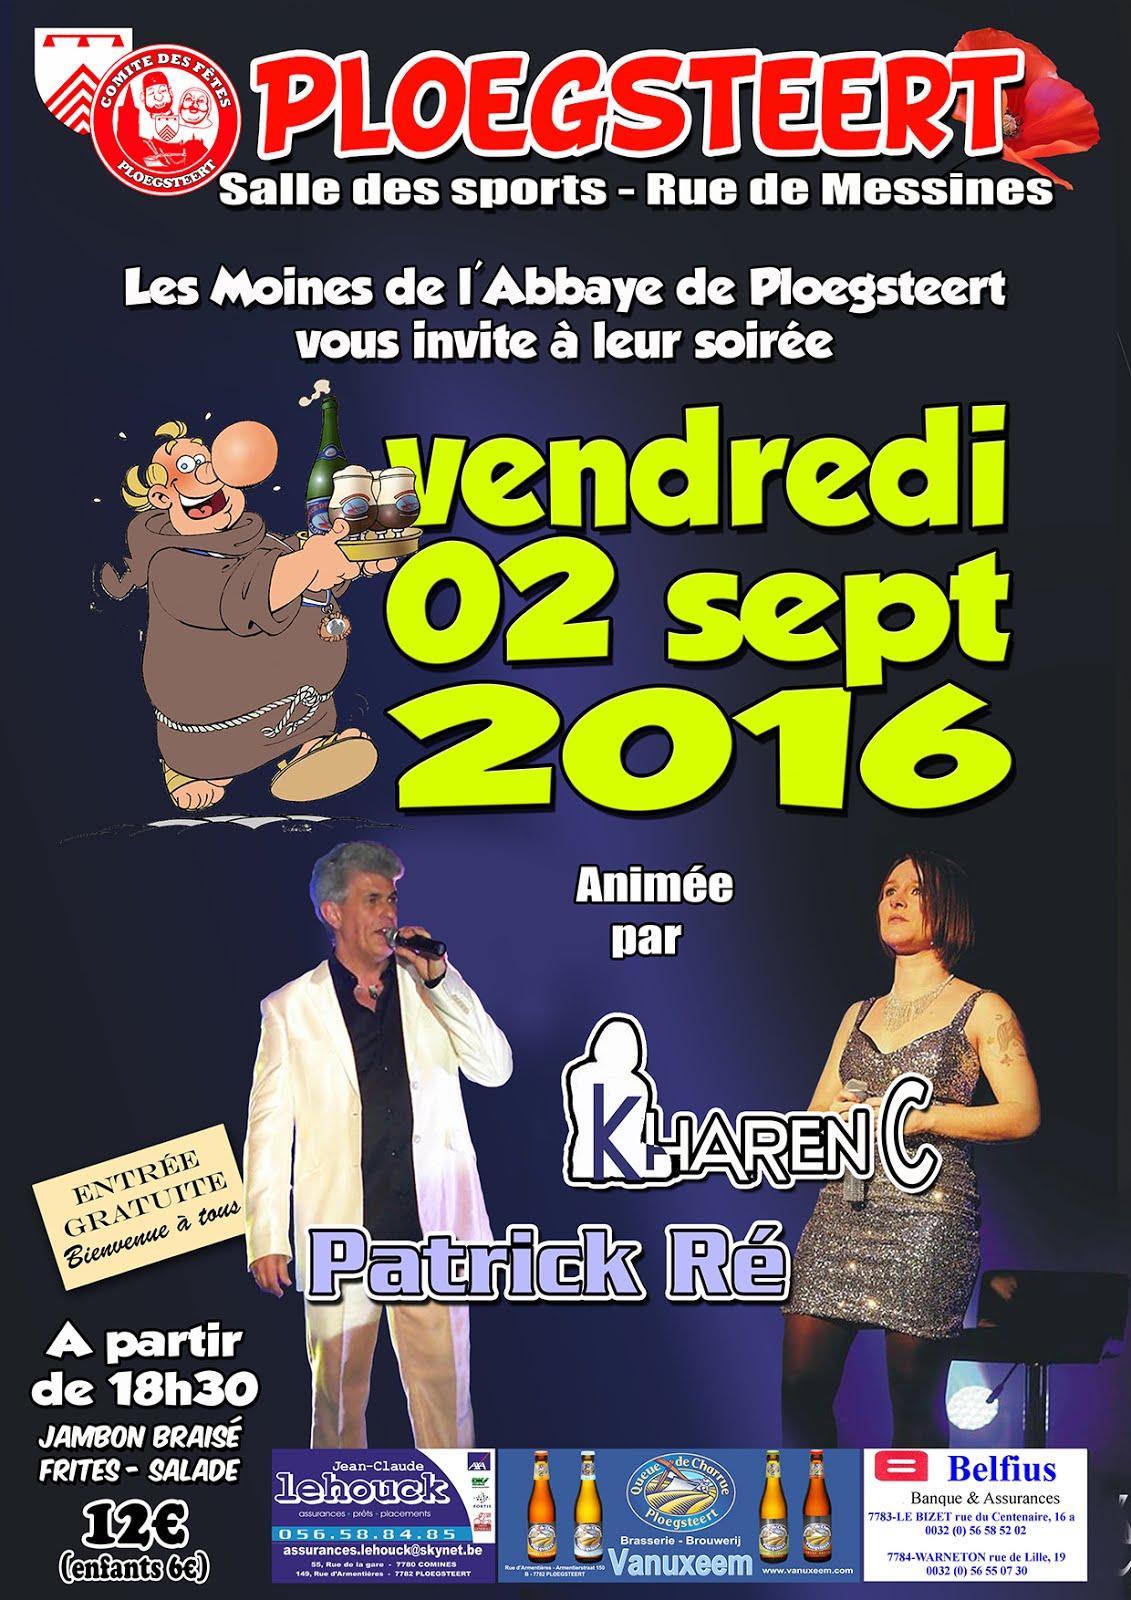 2 septembre soirée de l'Abbaye de Ploegsteert